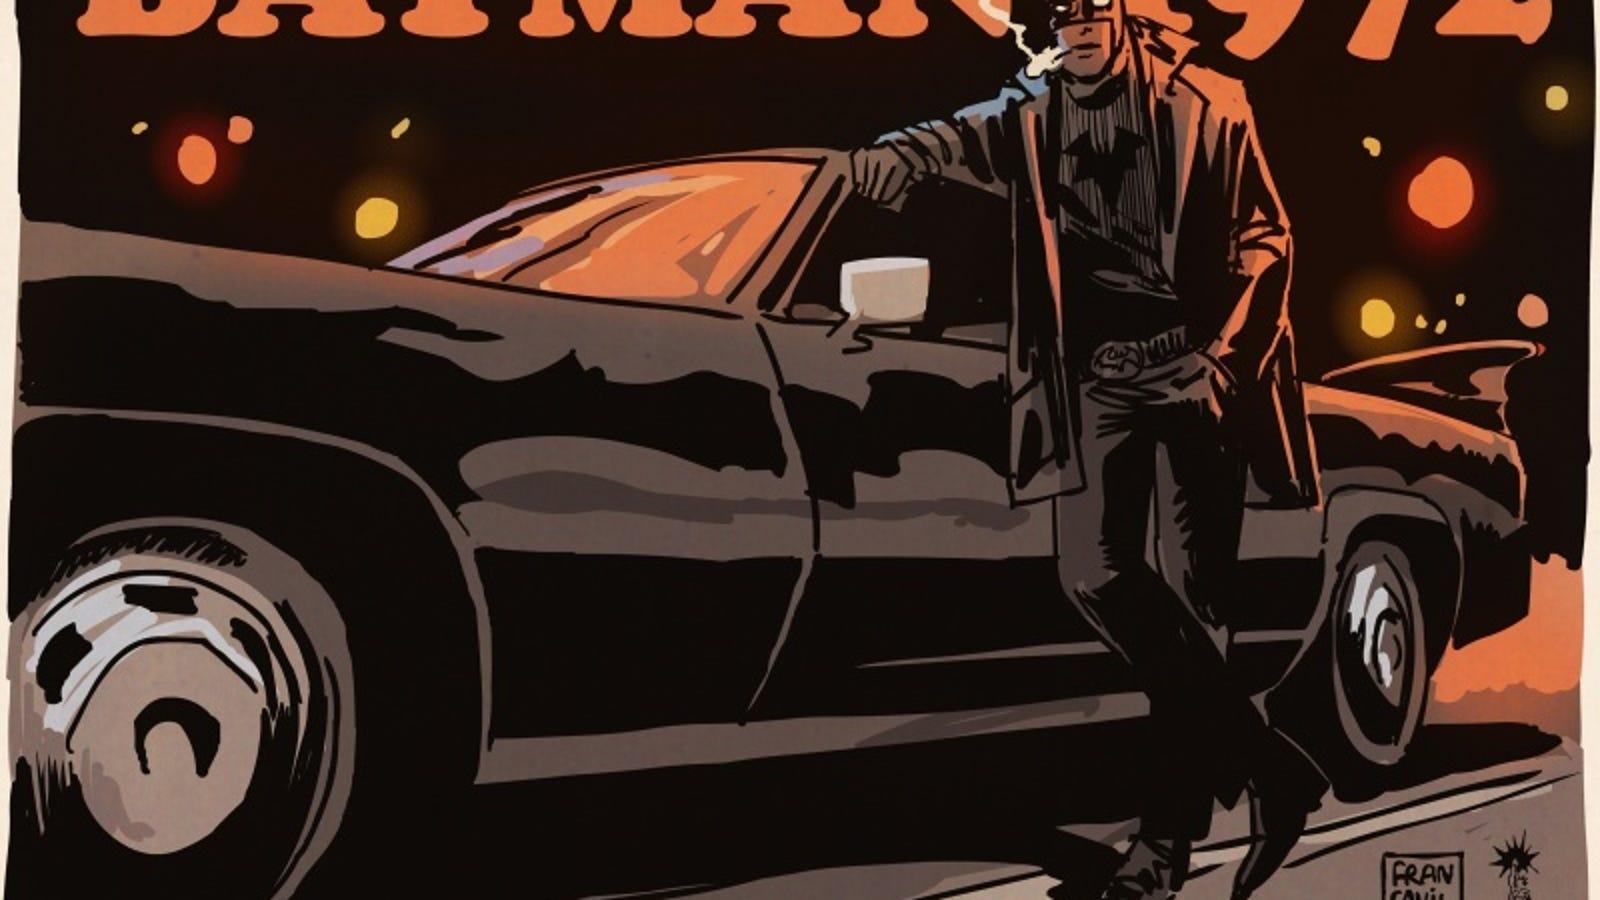 Batman reimagined as a 1970s grindhouse flick